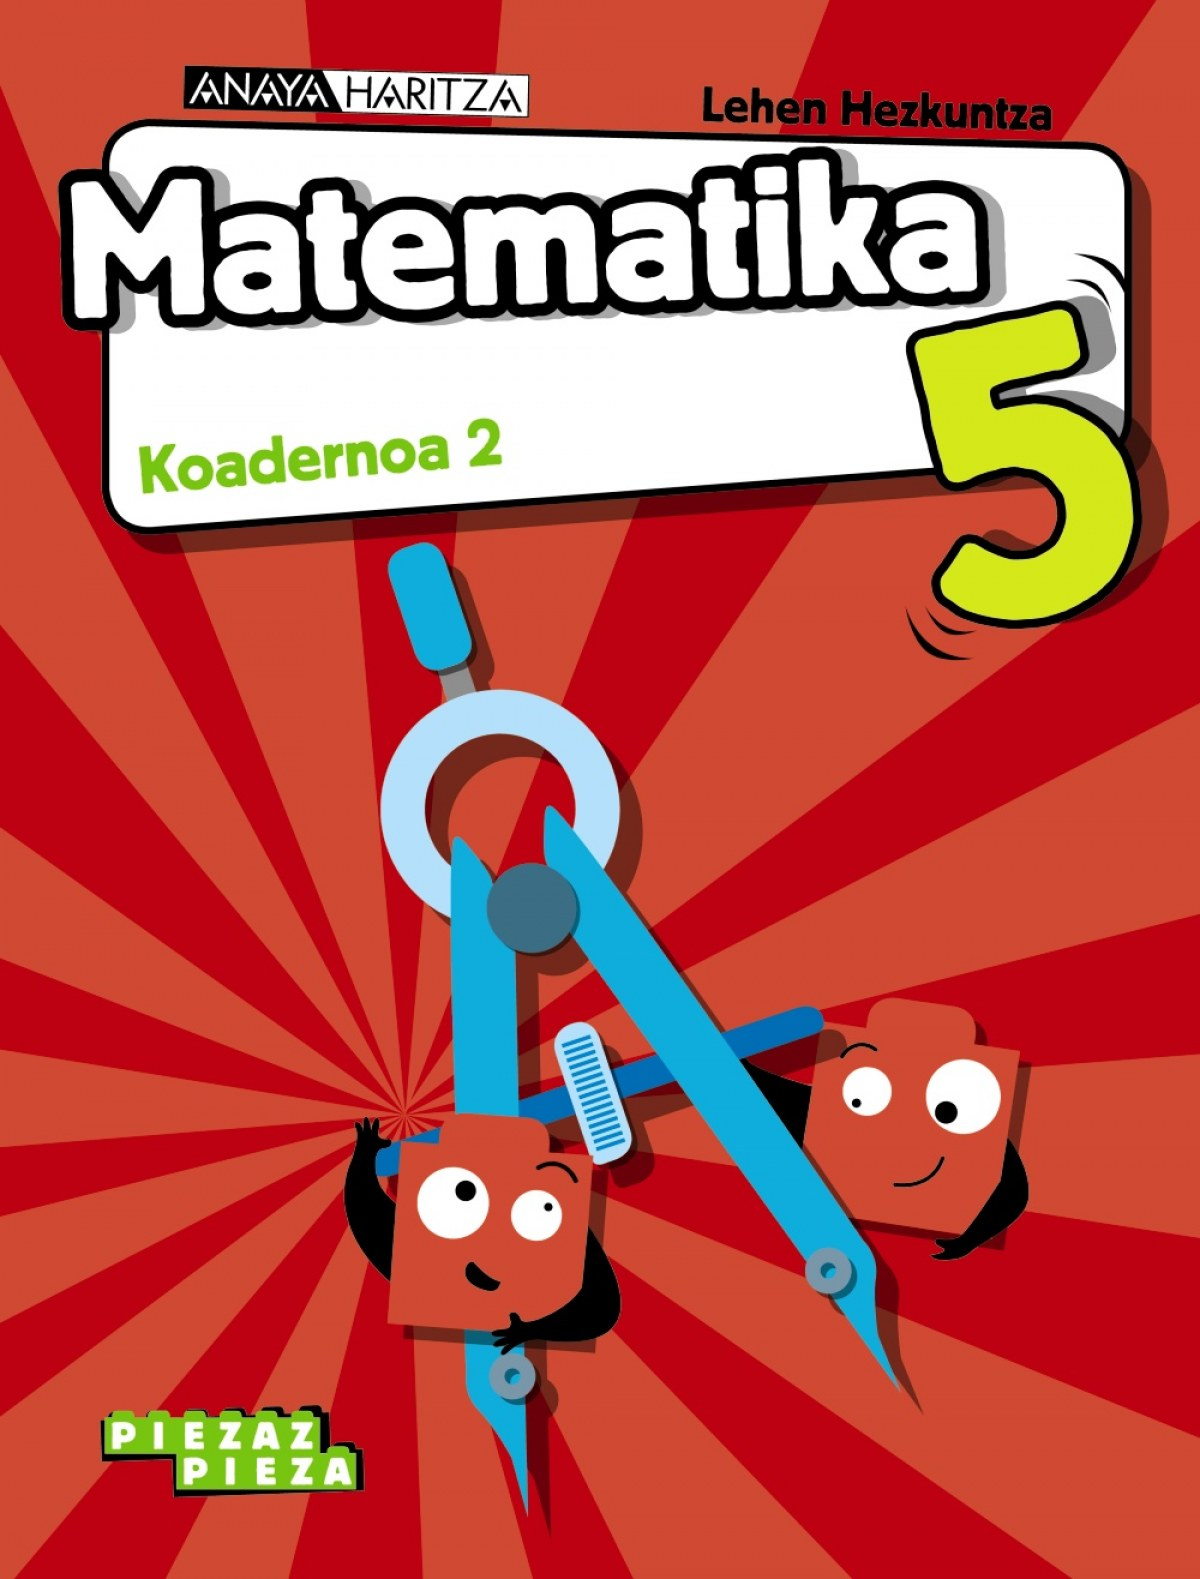 Matematika 5. Koadernoa 2.